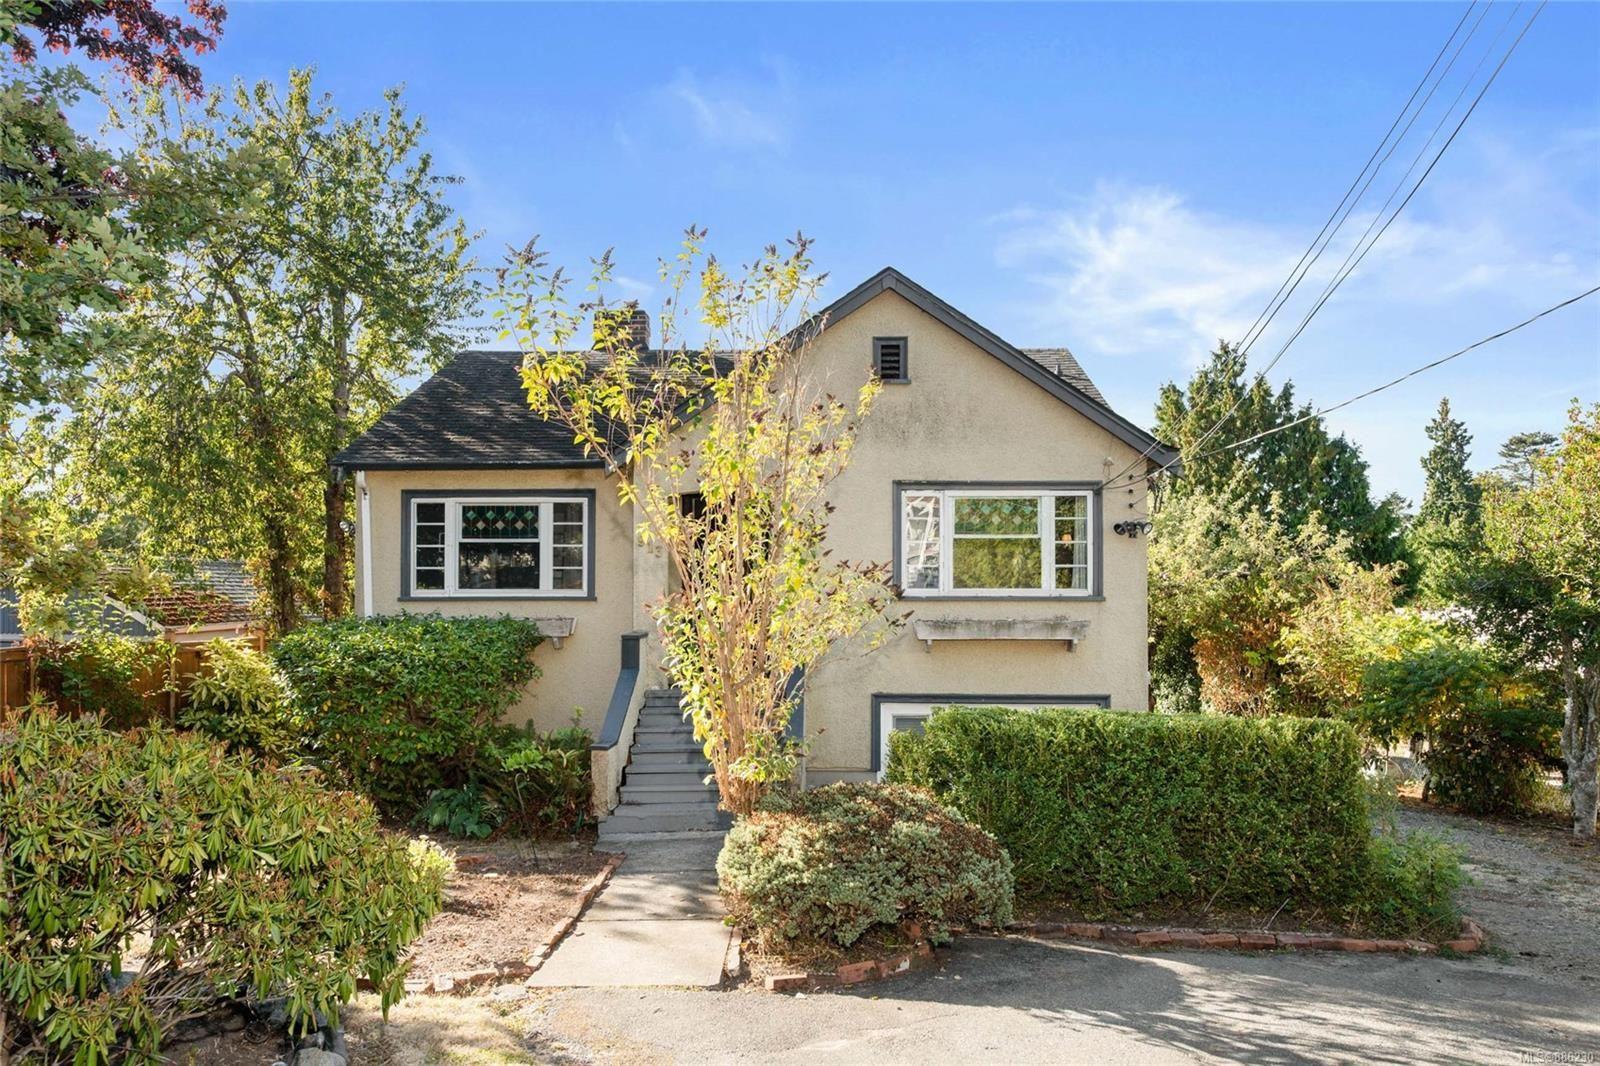 Main Photo: 913 Darwin Ave in : SW Gateway House for sale (Saanich West)  : MLS®# 886230